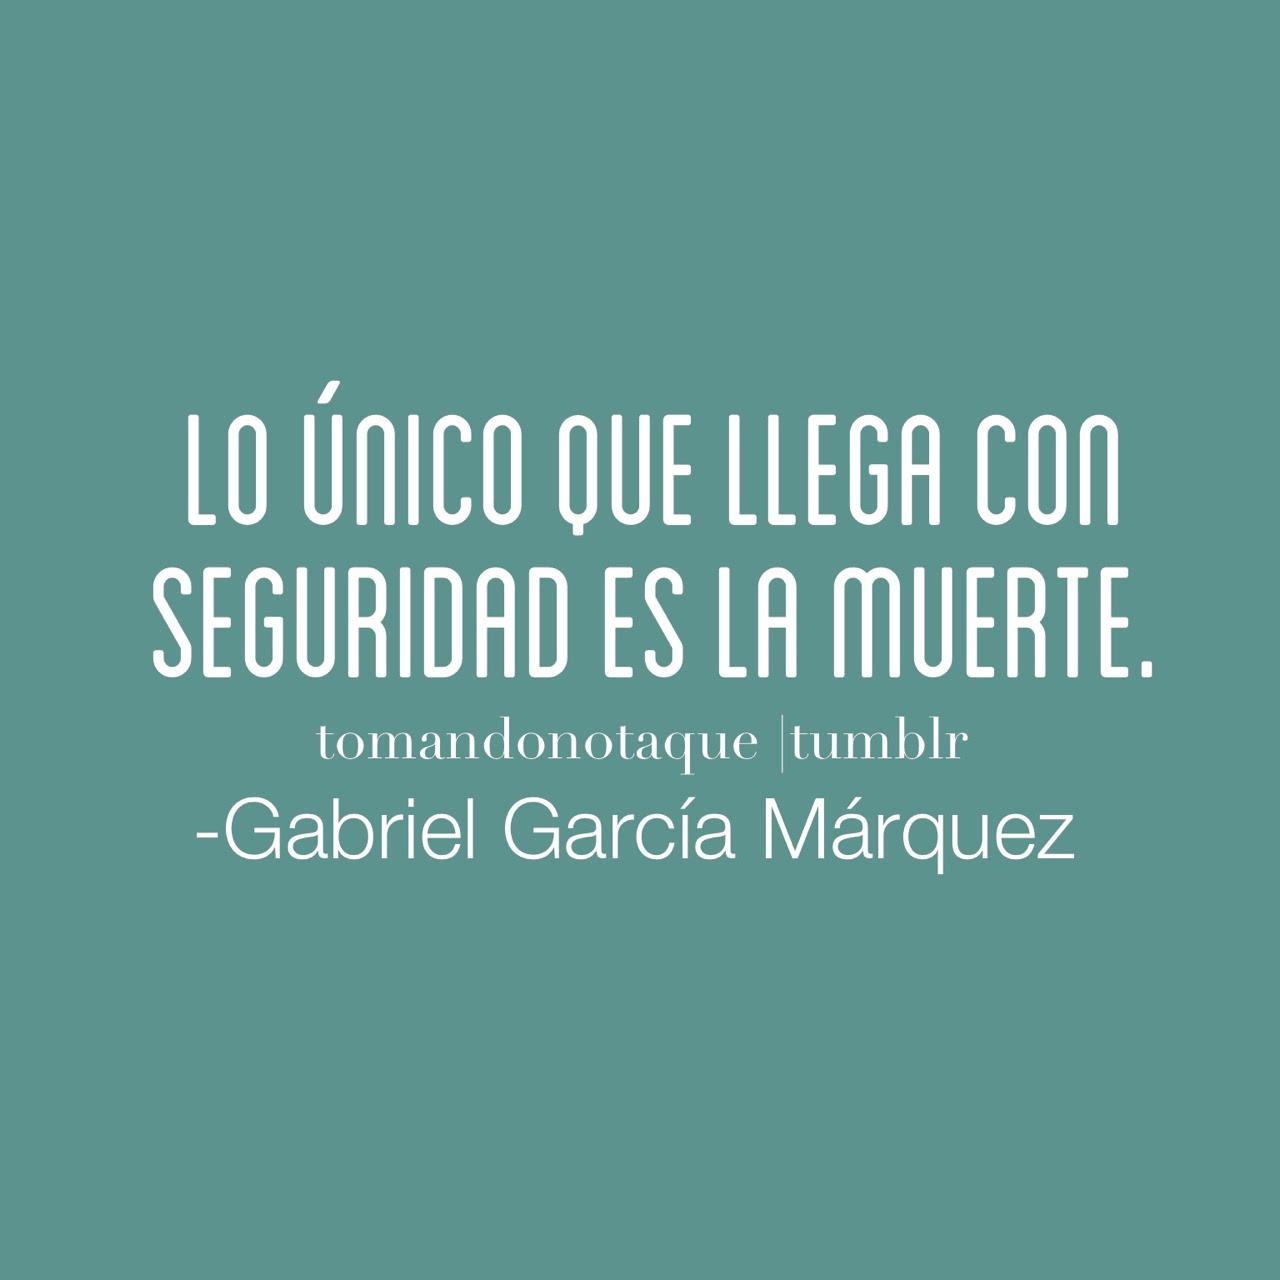 Frases De Amor Tumblr En Ingles Traducidas Lamaran M